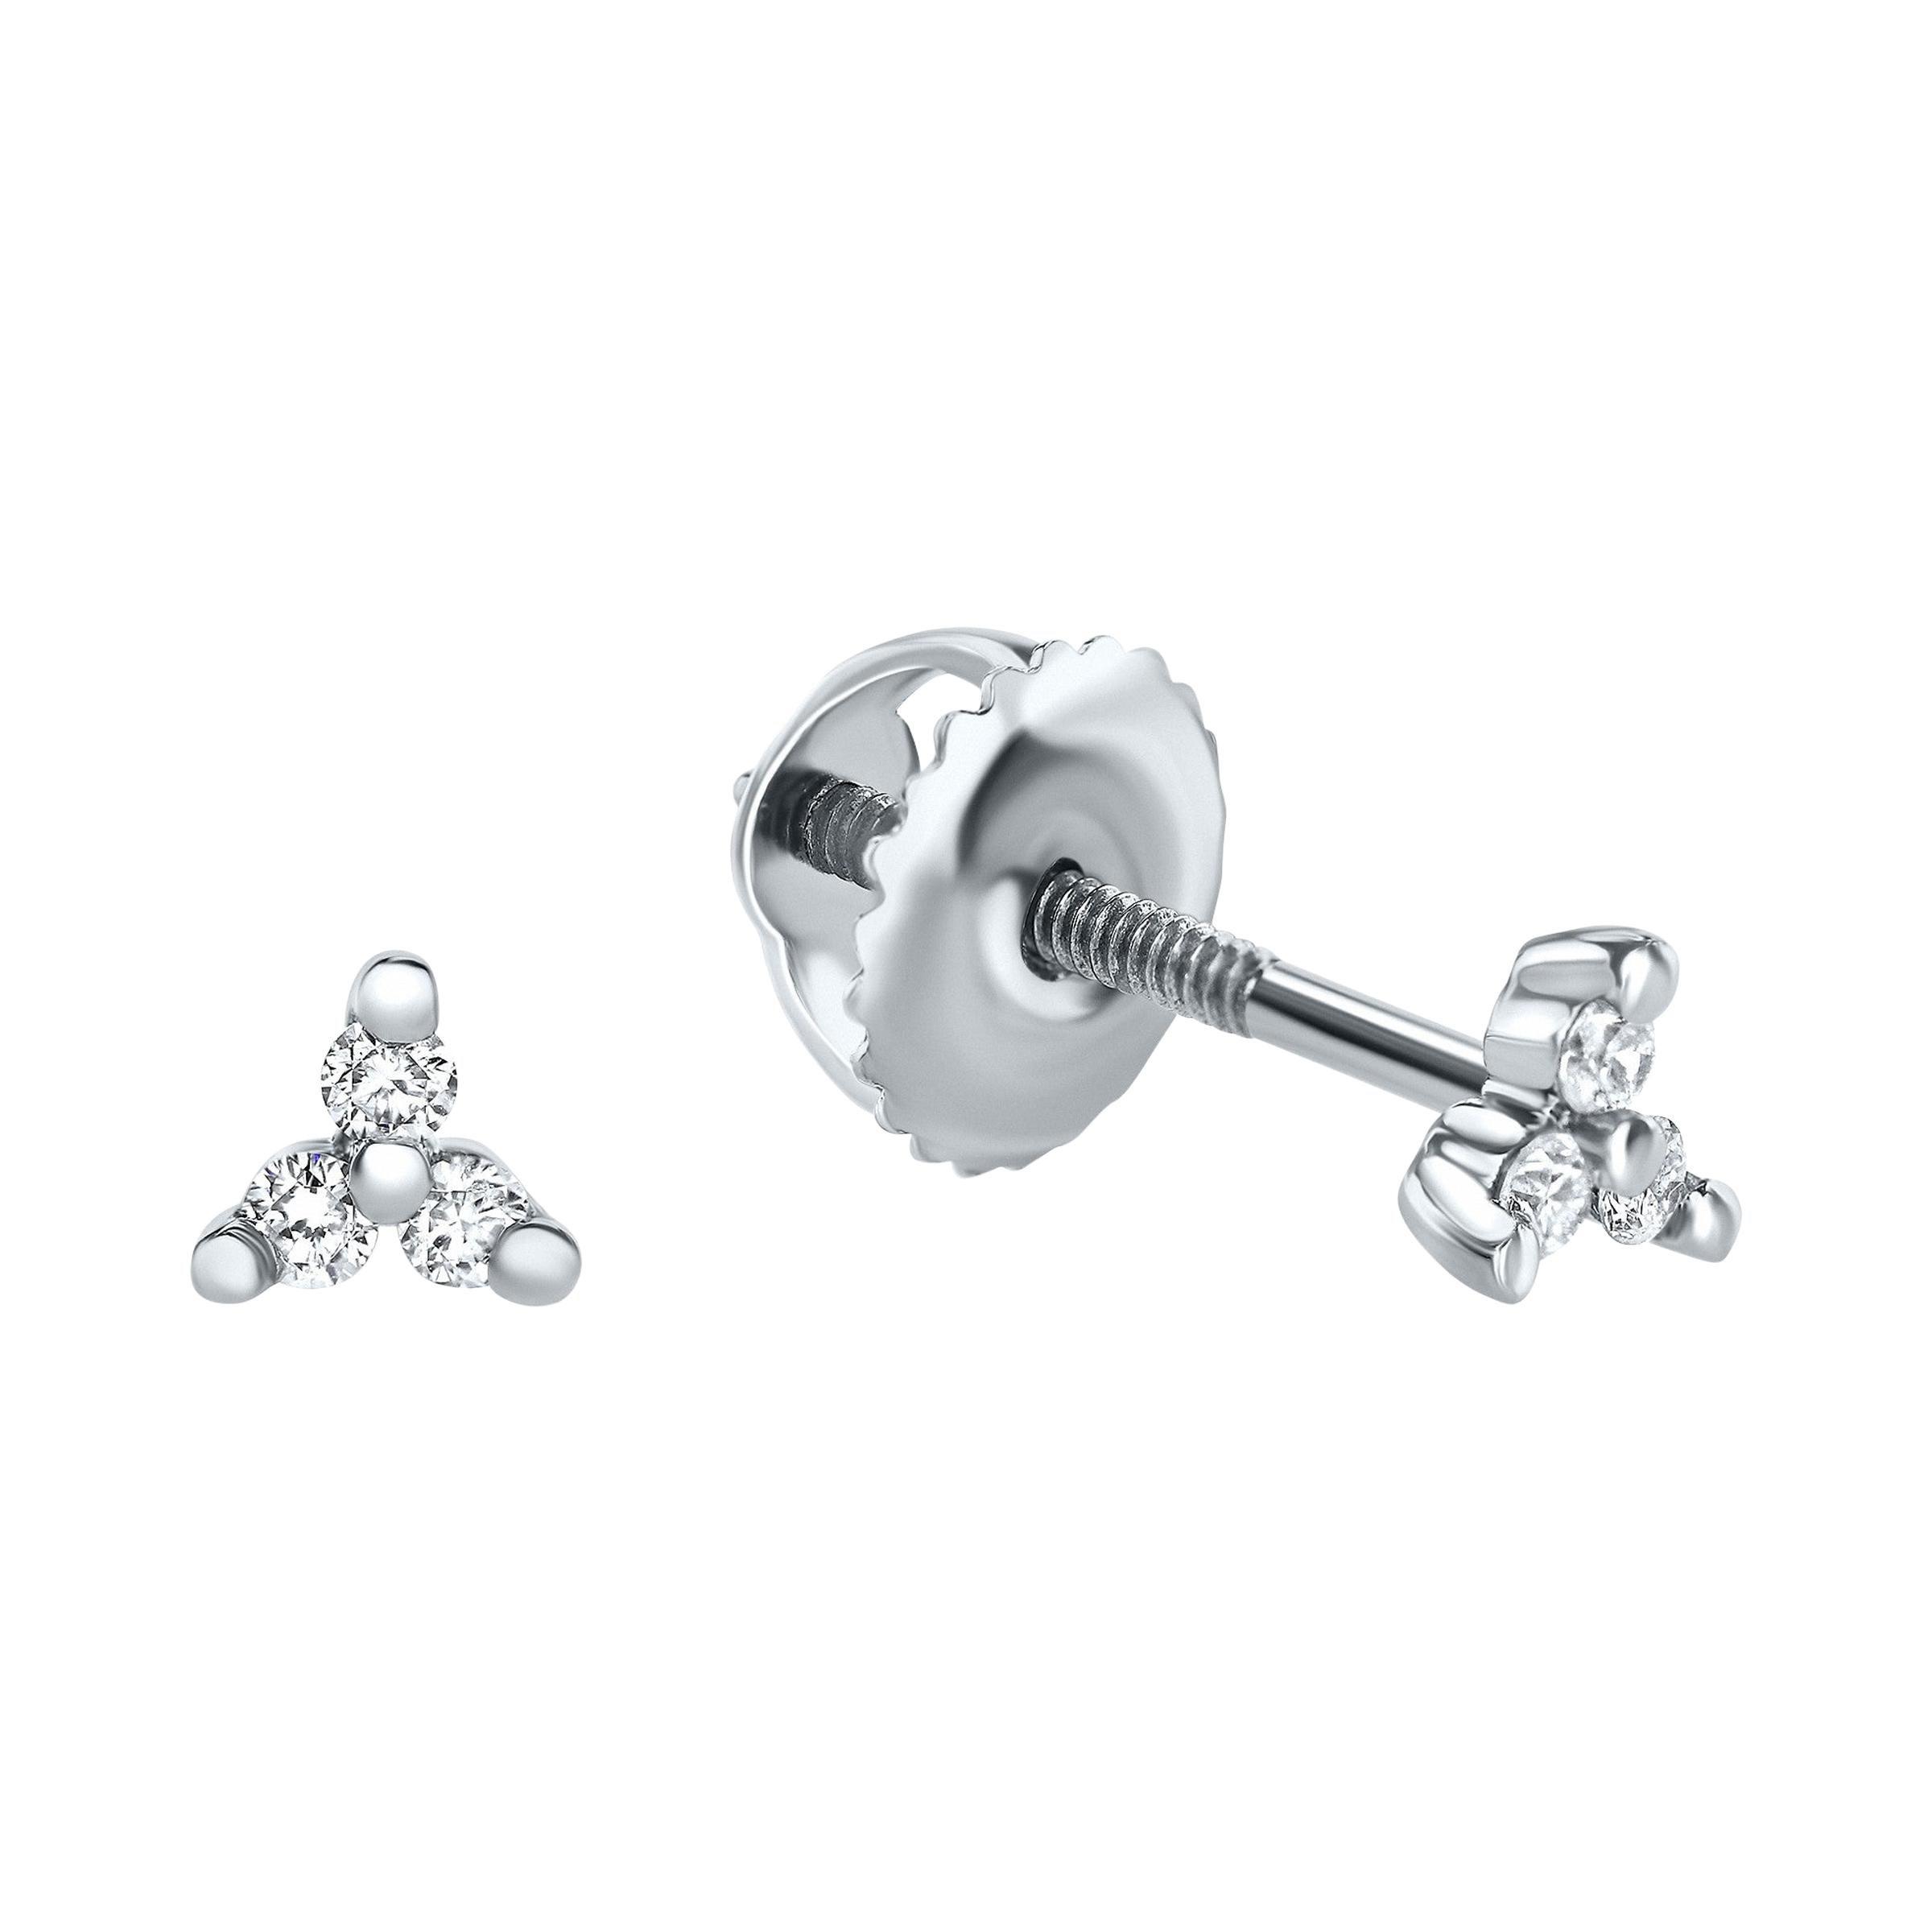 0.06 Carat Diamond Mini Trinity Stud Earrings in 14k White Gold, Shlomit Rogel